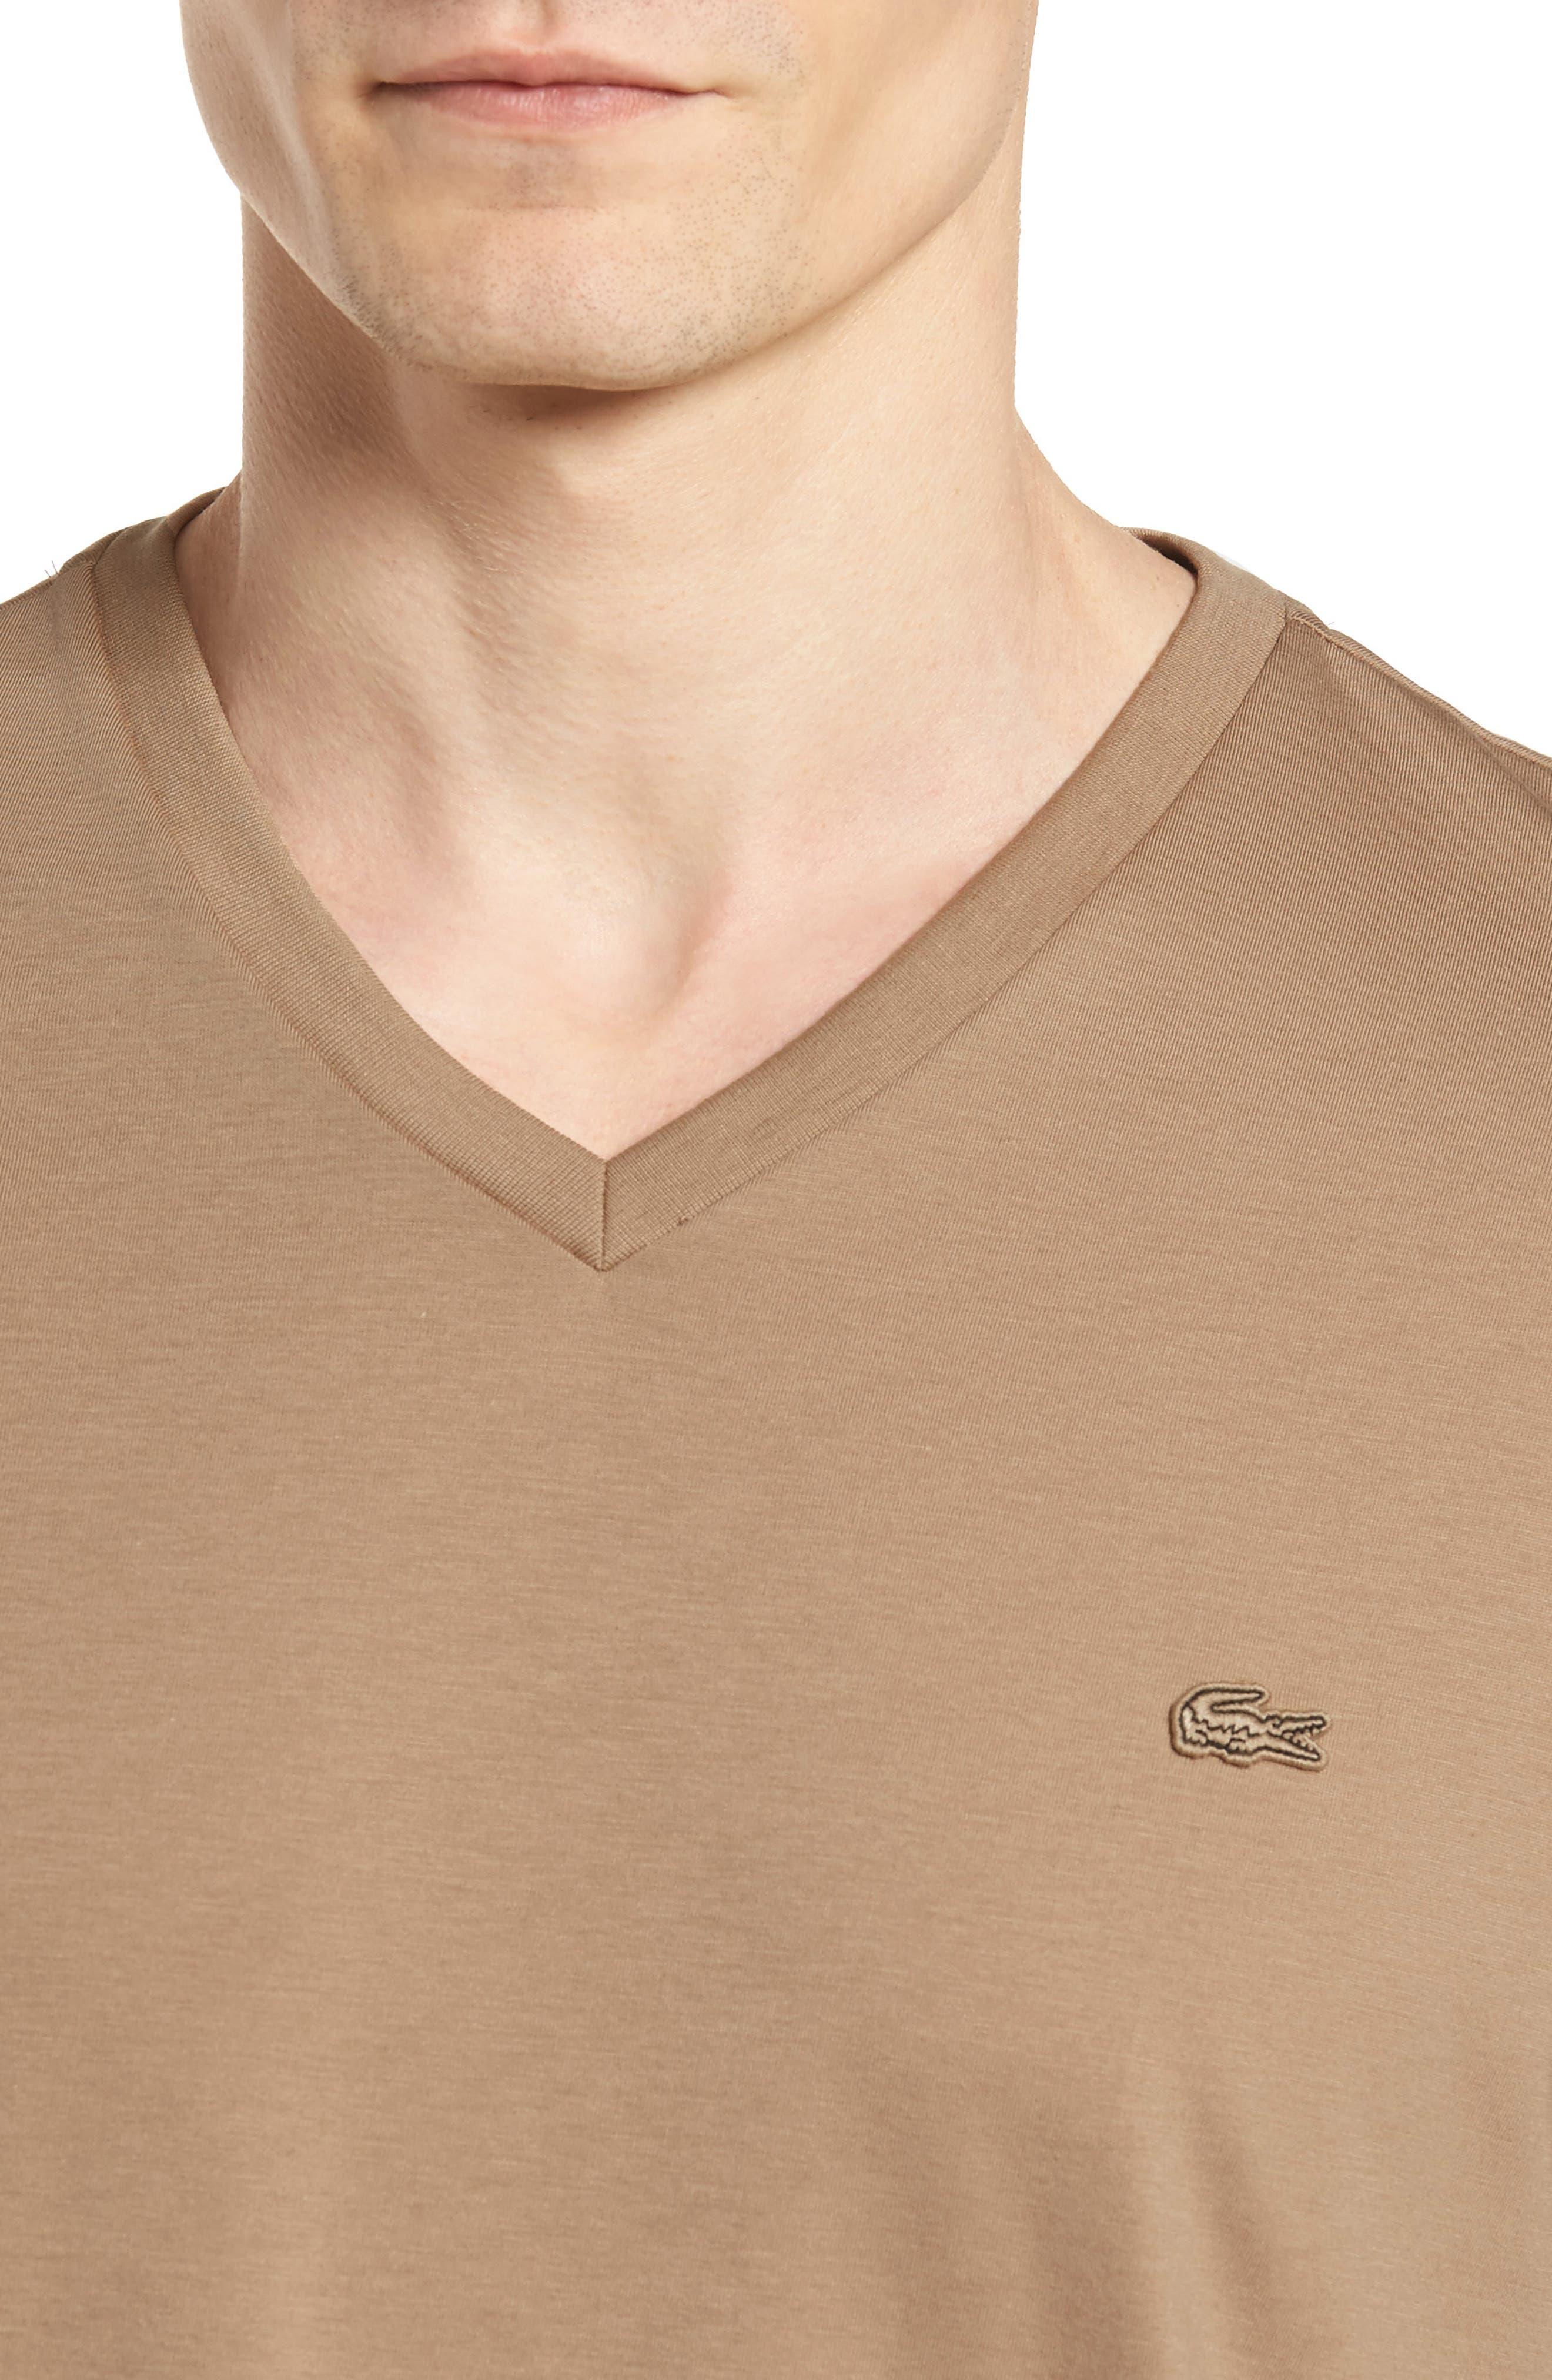 Pima Cotton T-Shirt,                             Alternate thumbnail 4, color,                             KRAFT BEIGE